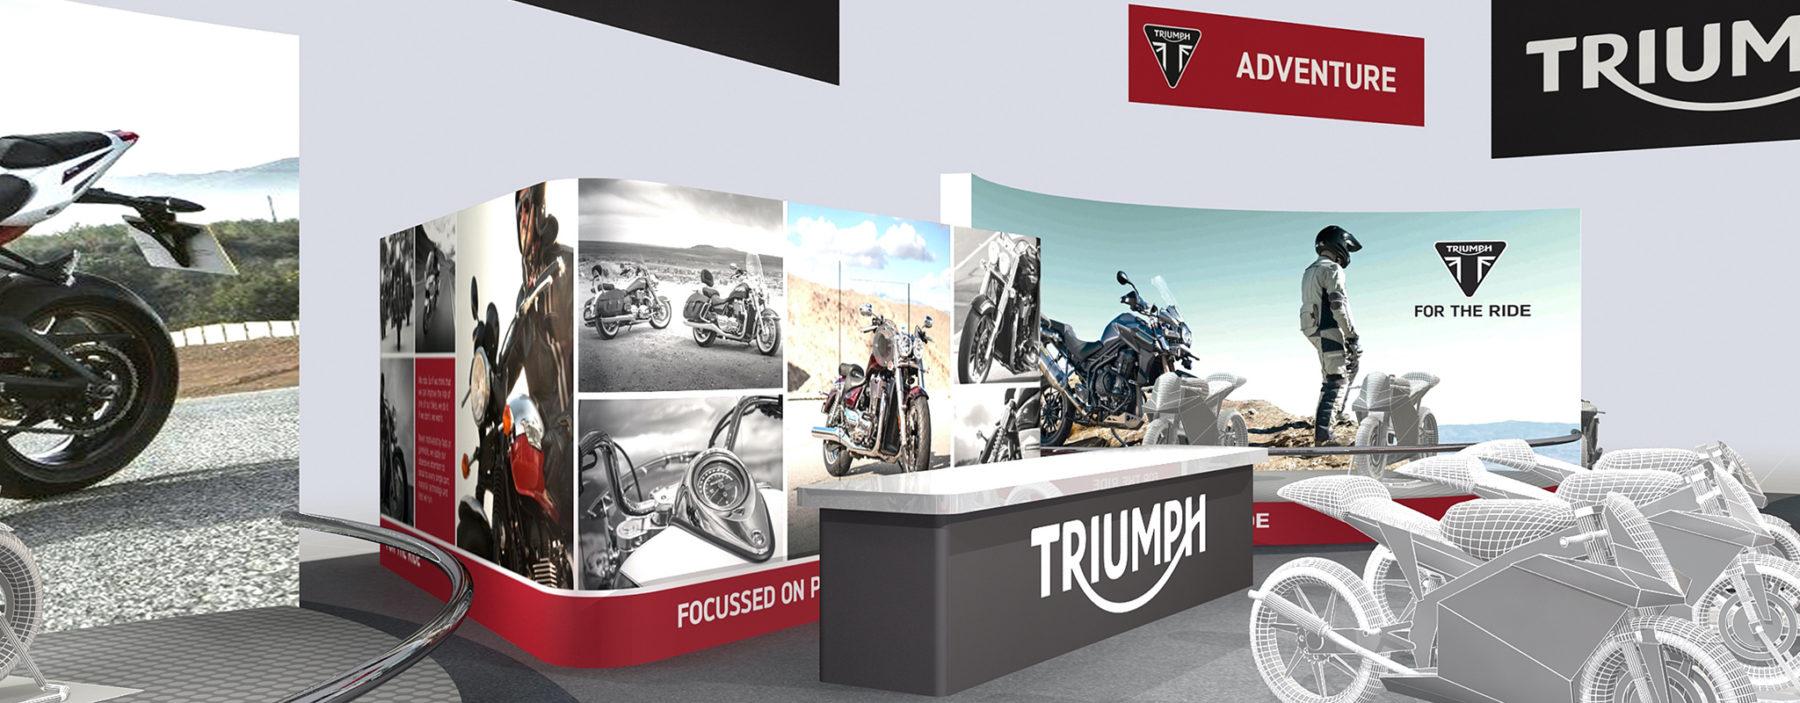 Exhibition stand design solution for Triumph